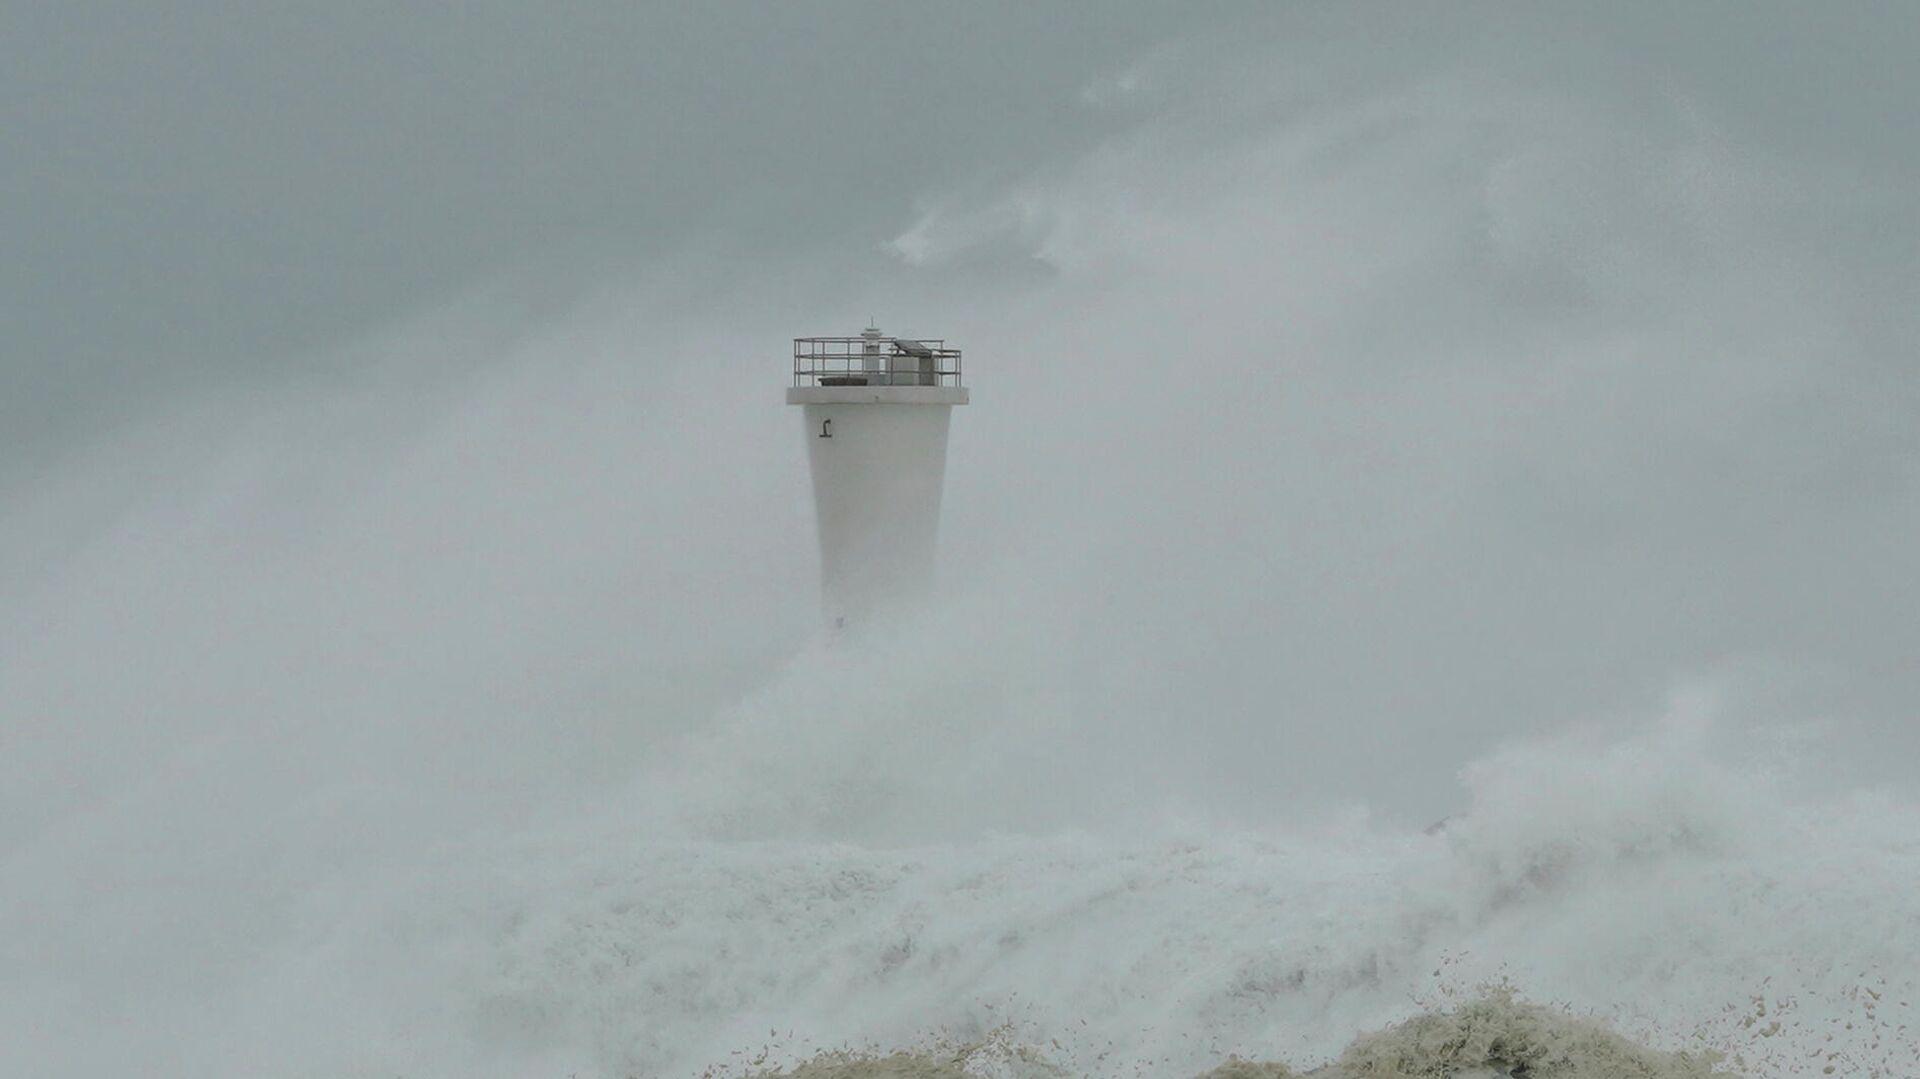 Тайфун Хагибис в Японии. 12 октября 2019 - РИА Новости, 1920, 25.10.2020